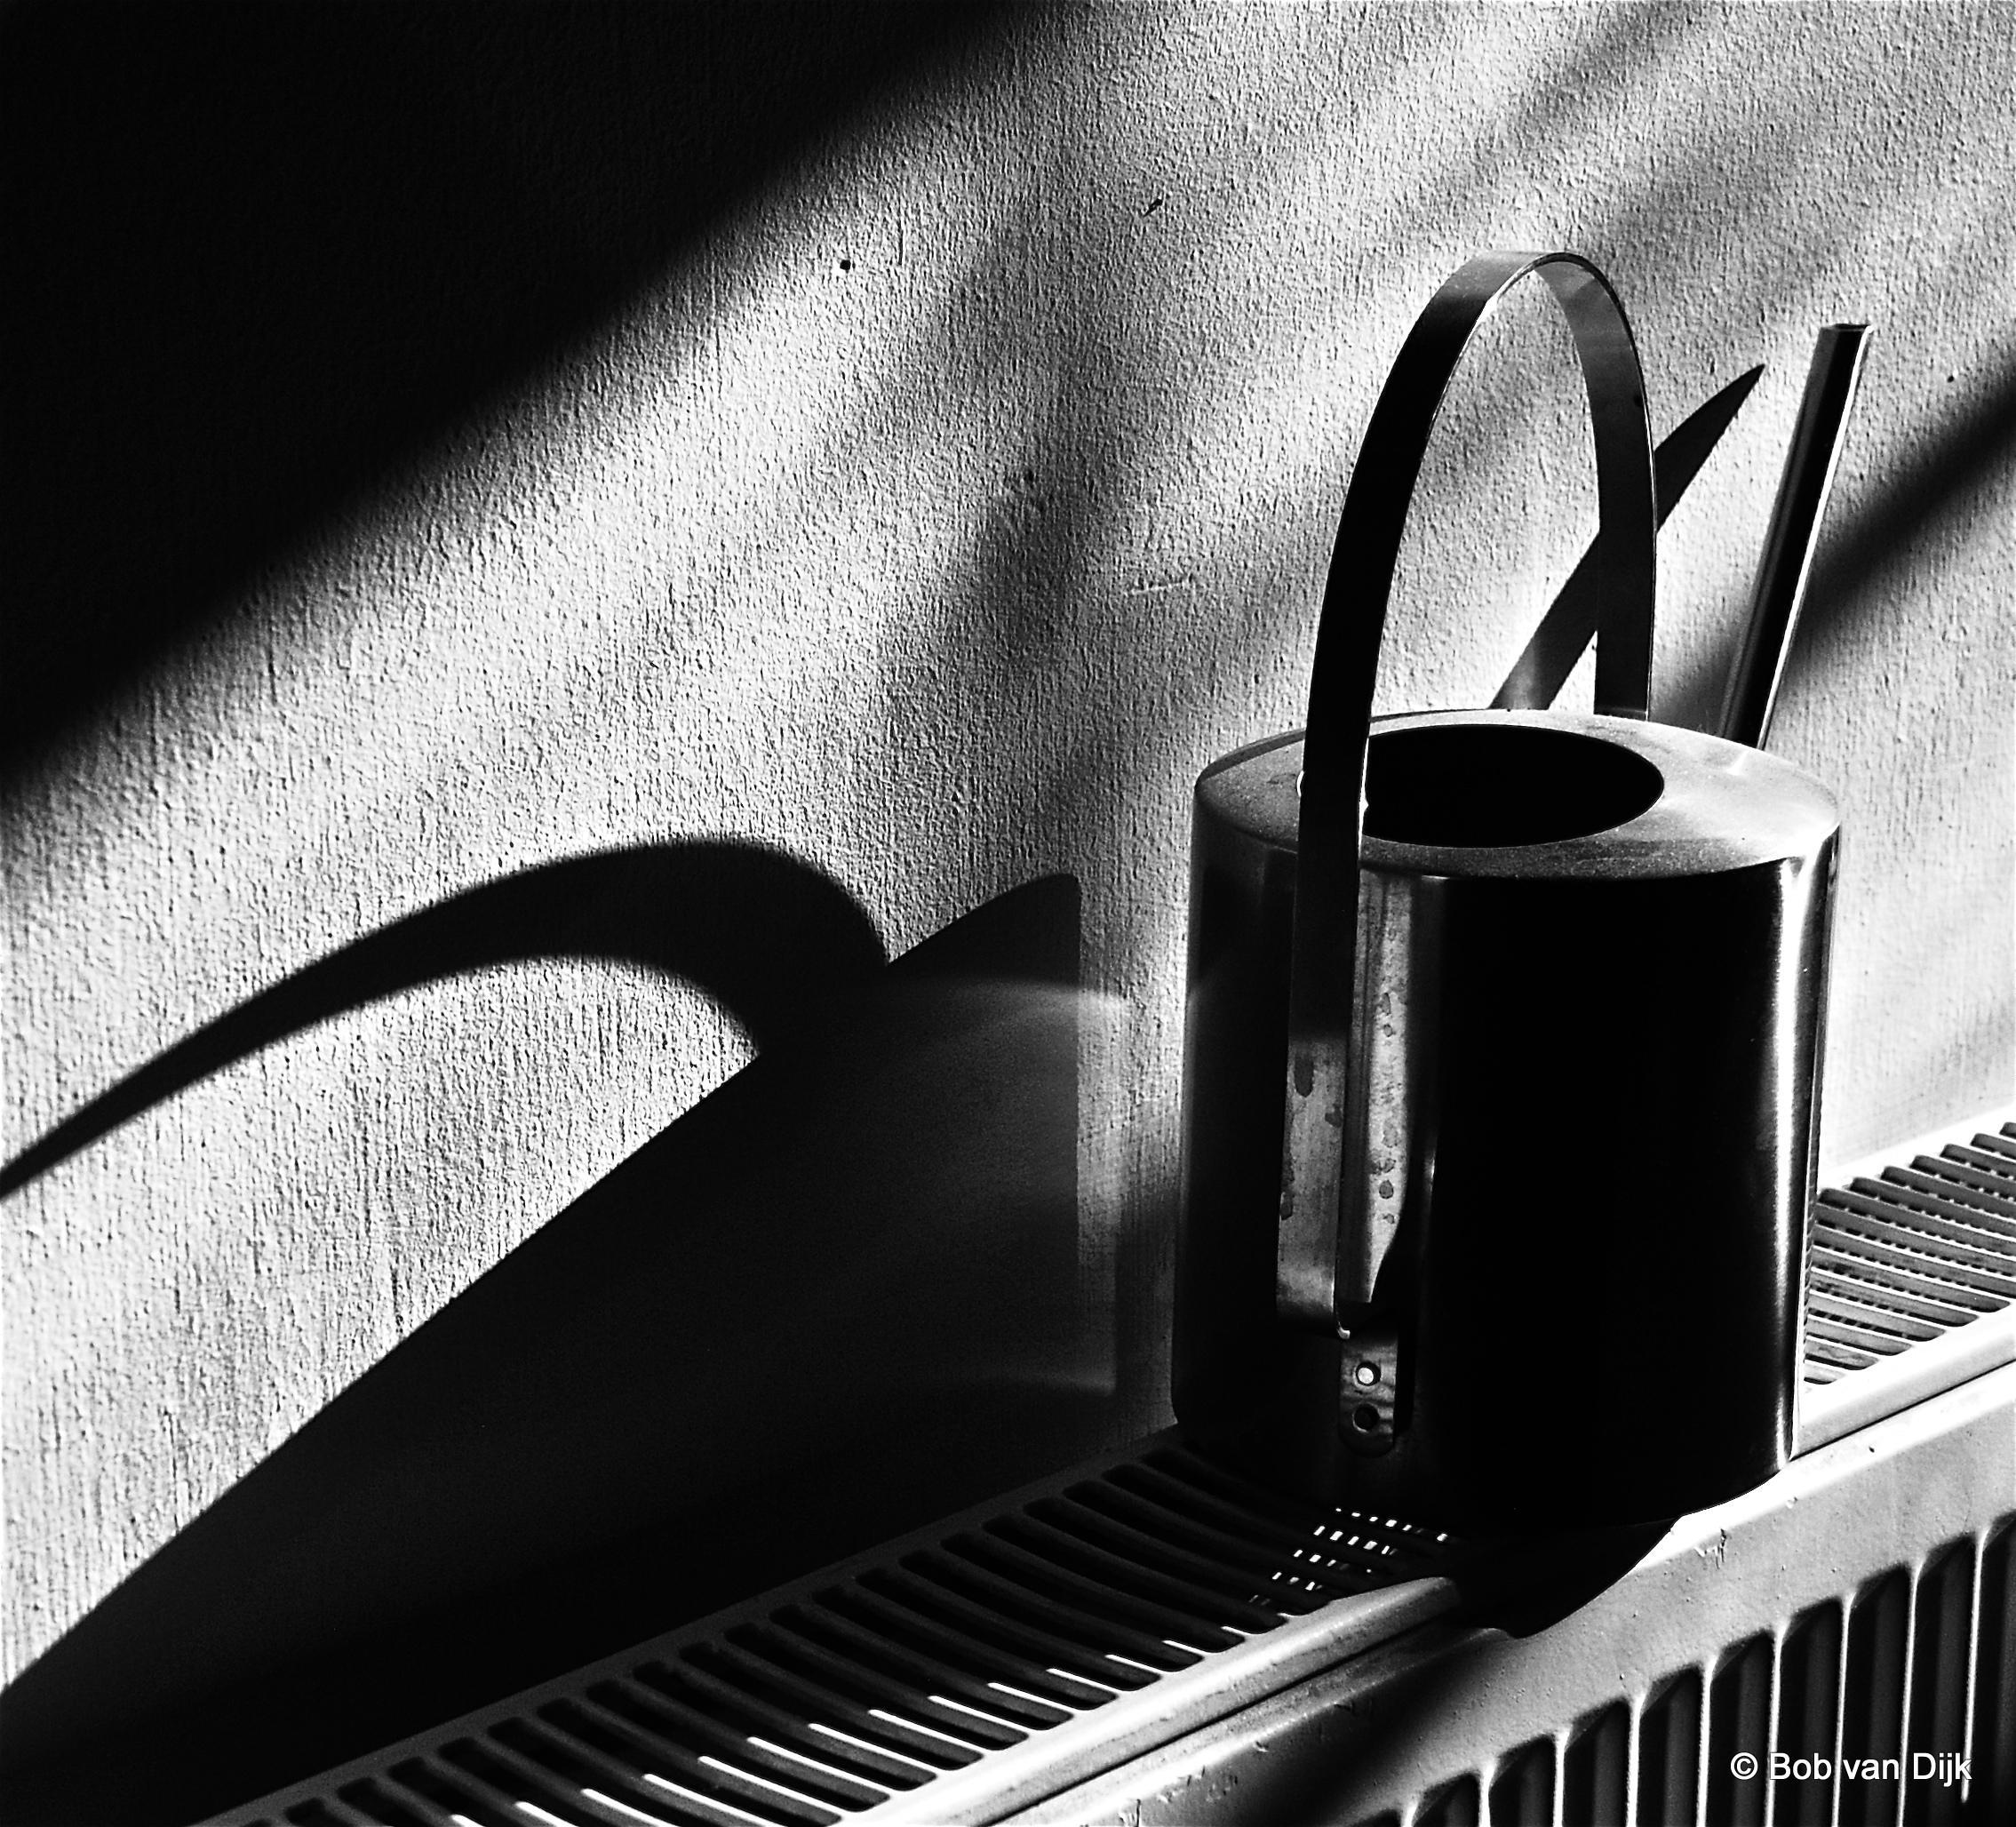 Inspired by André Kertész